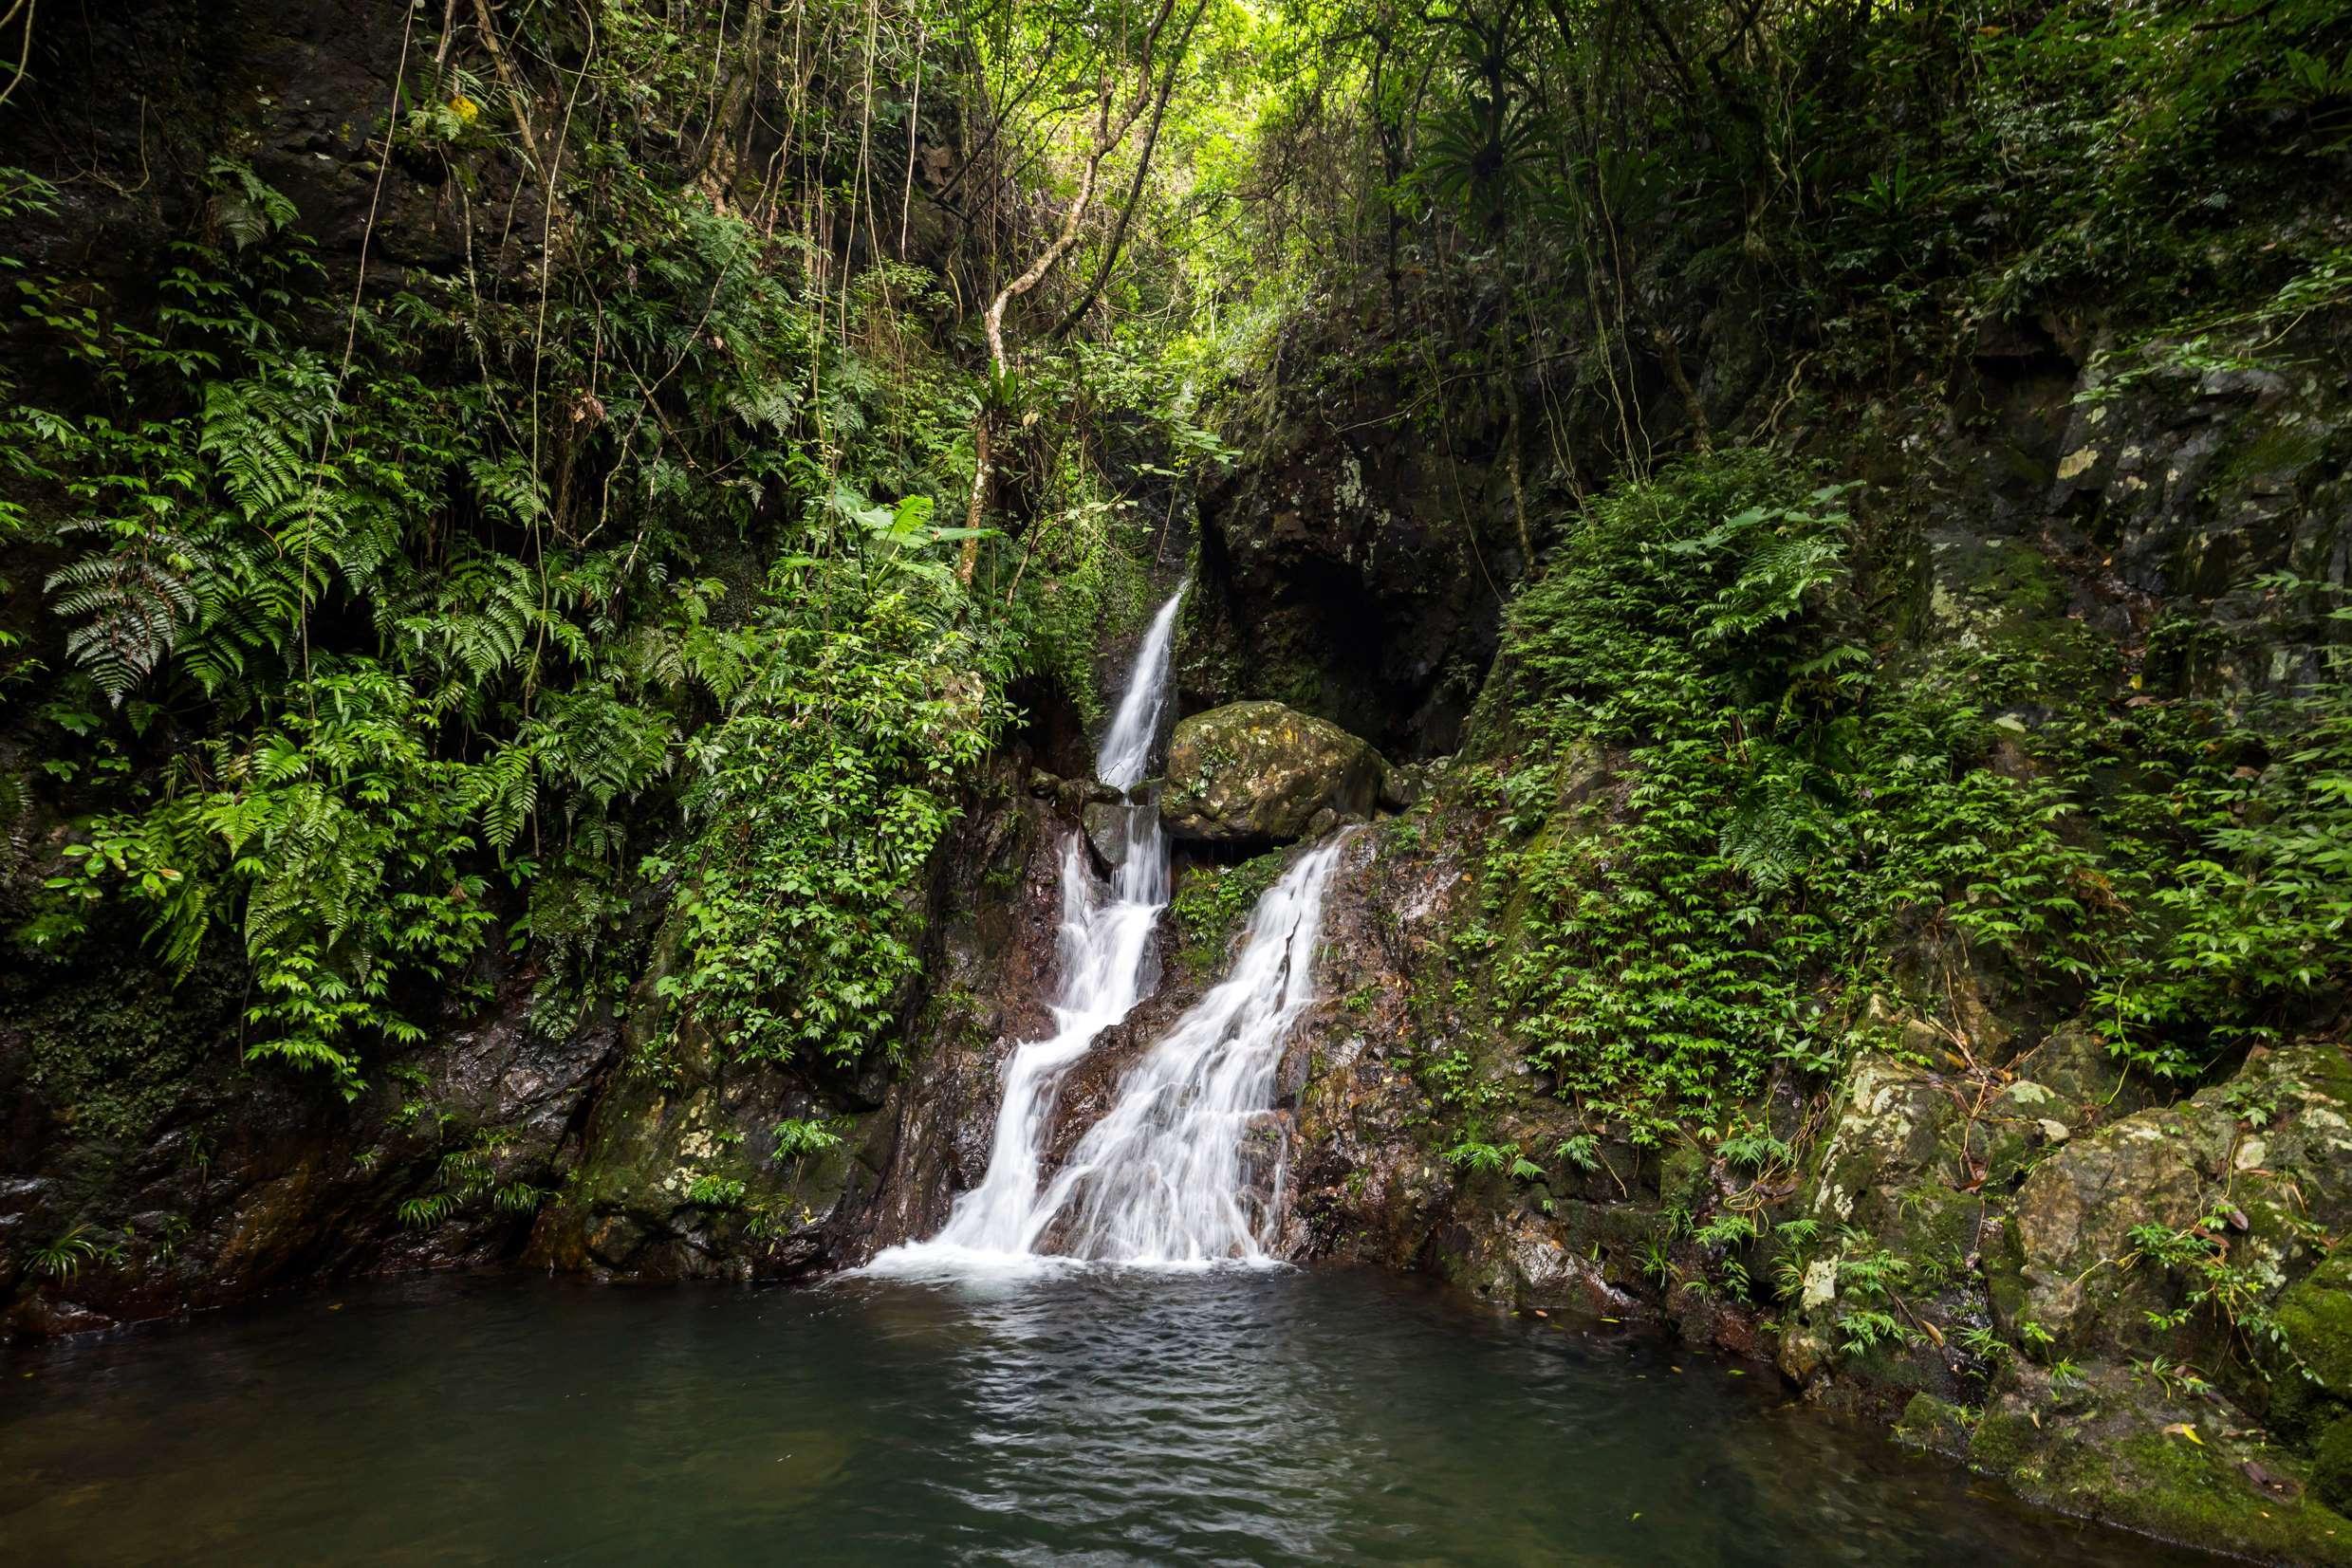 Ng Tung Chai Waterfall-Shutterstock24-01-2020